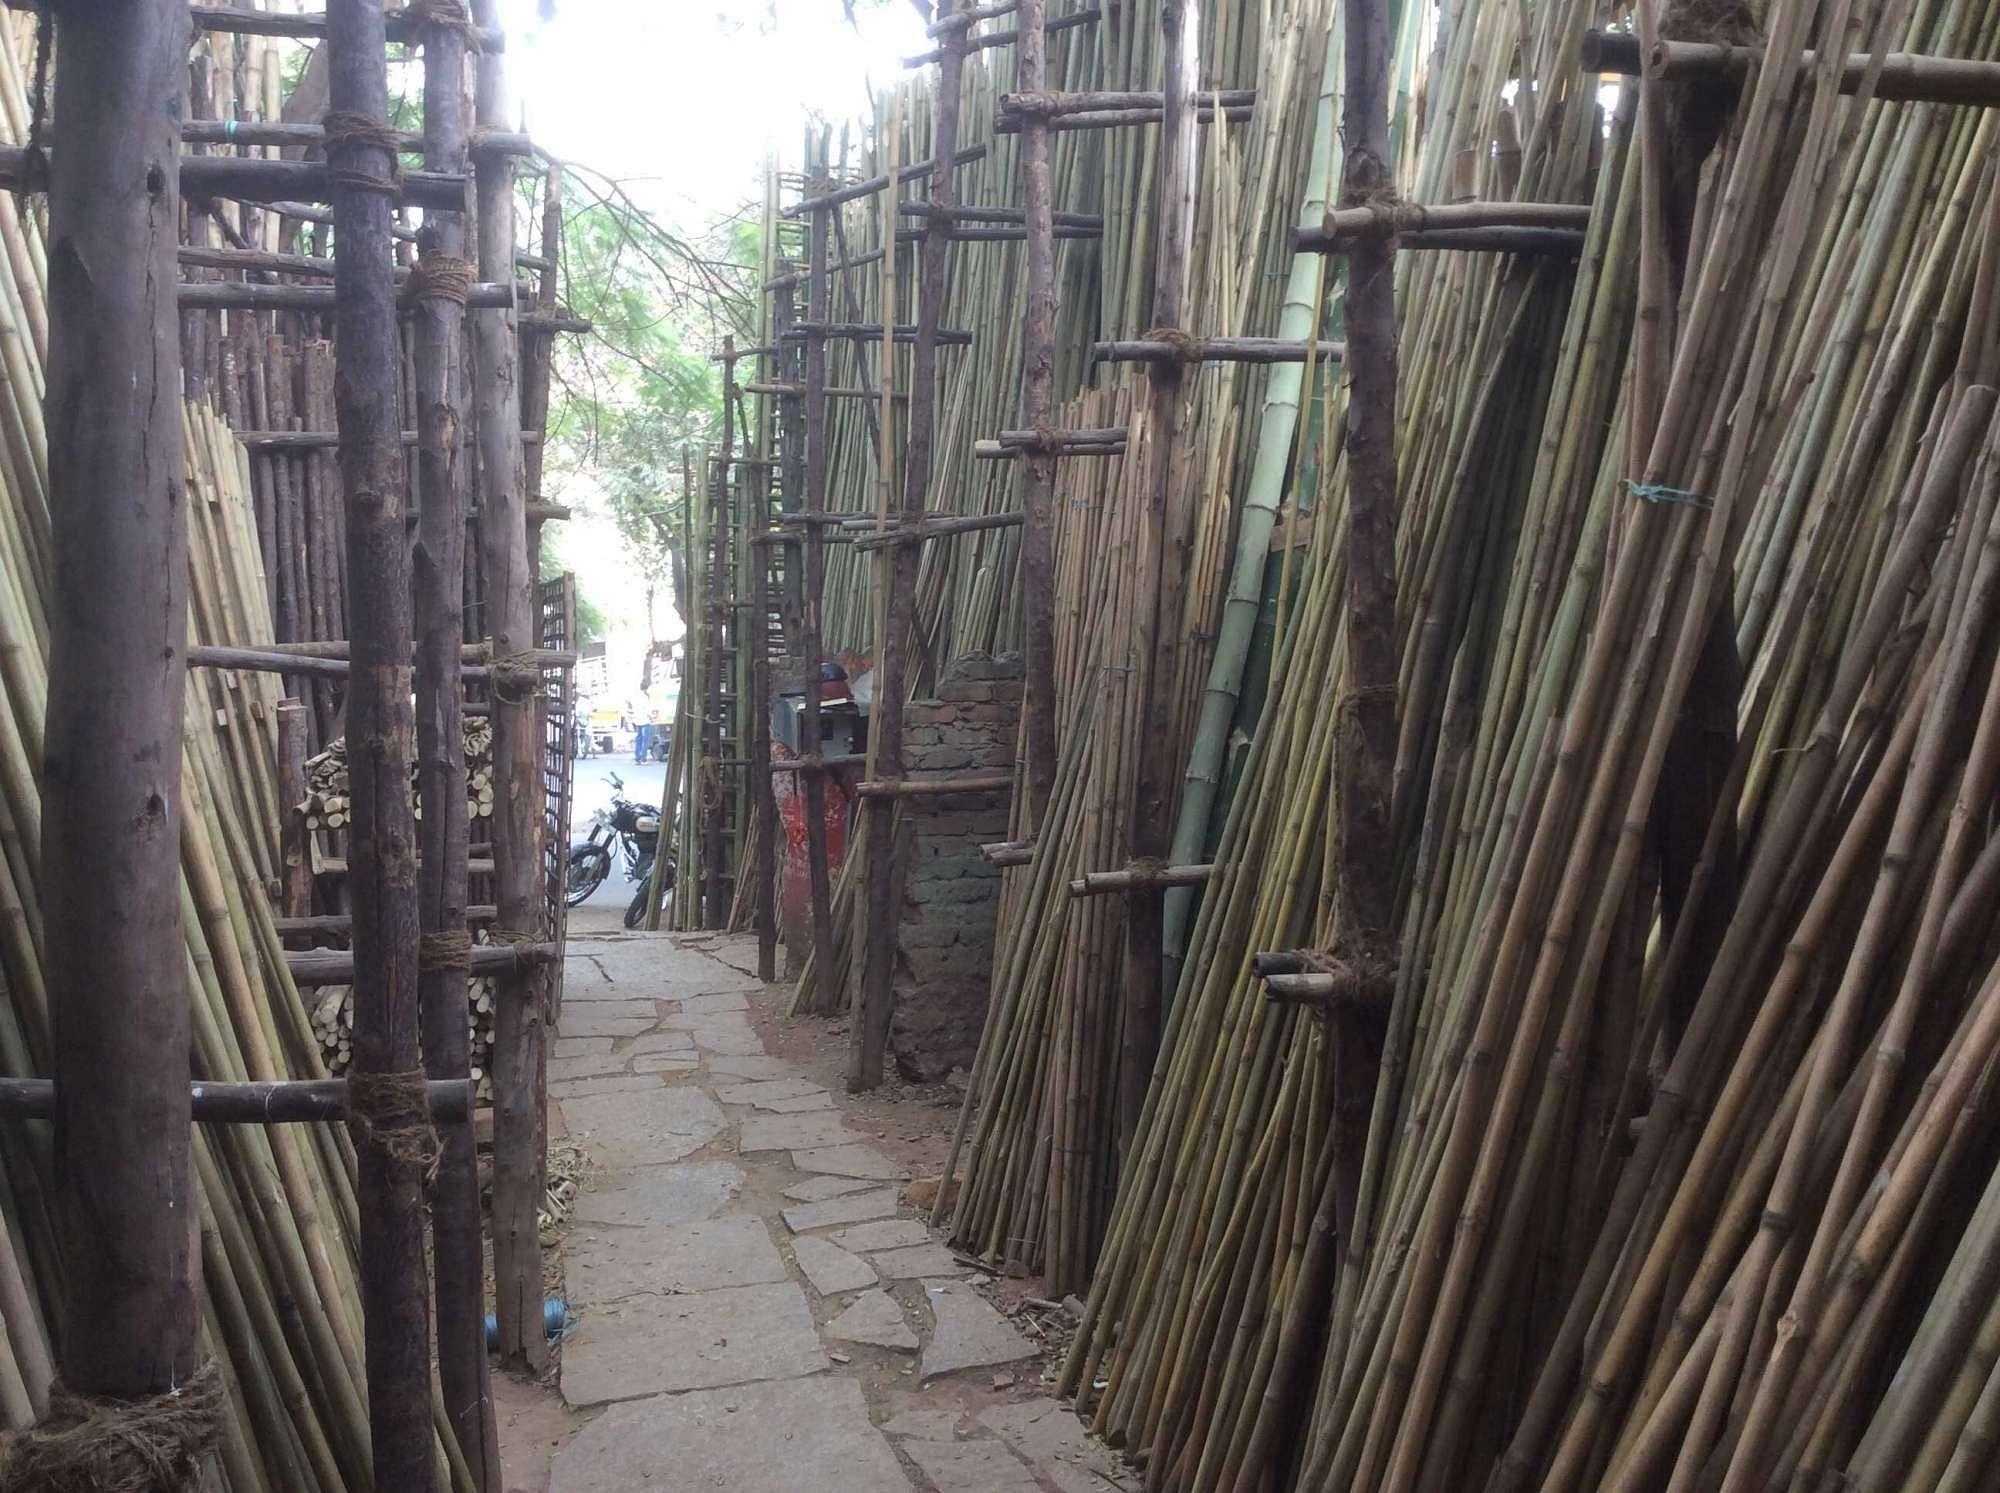 Bamboo Bazaar, Bengaluru. (Source: Just Dial)